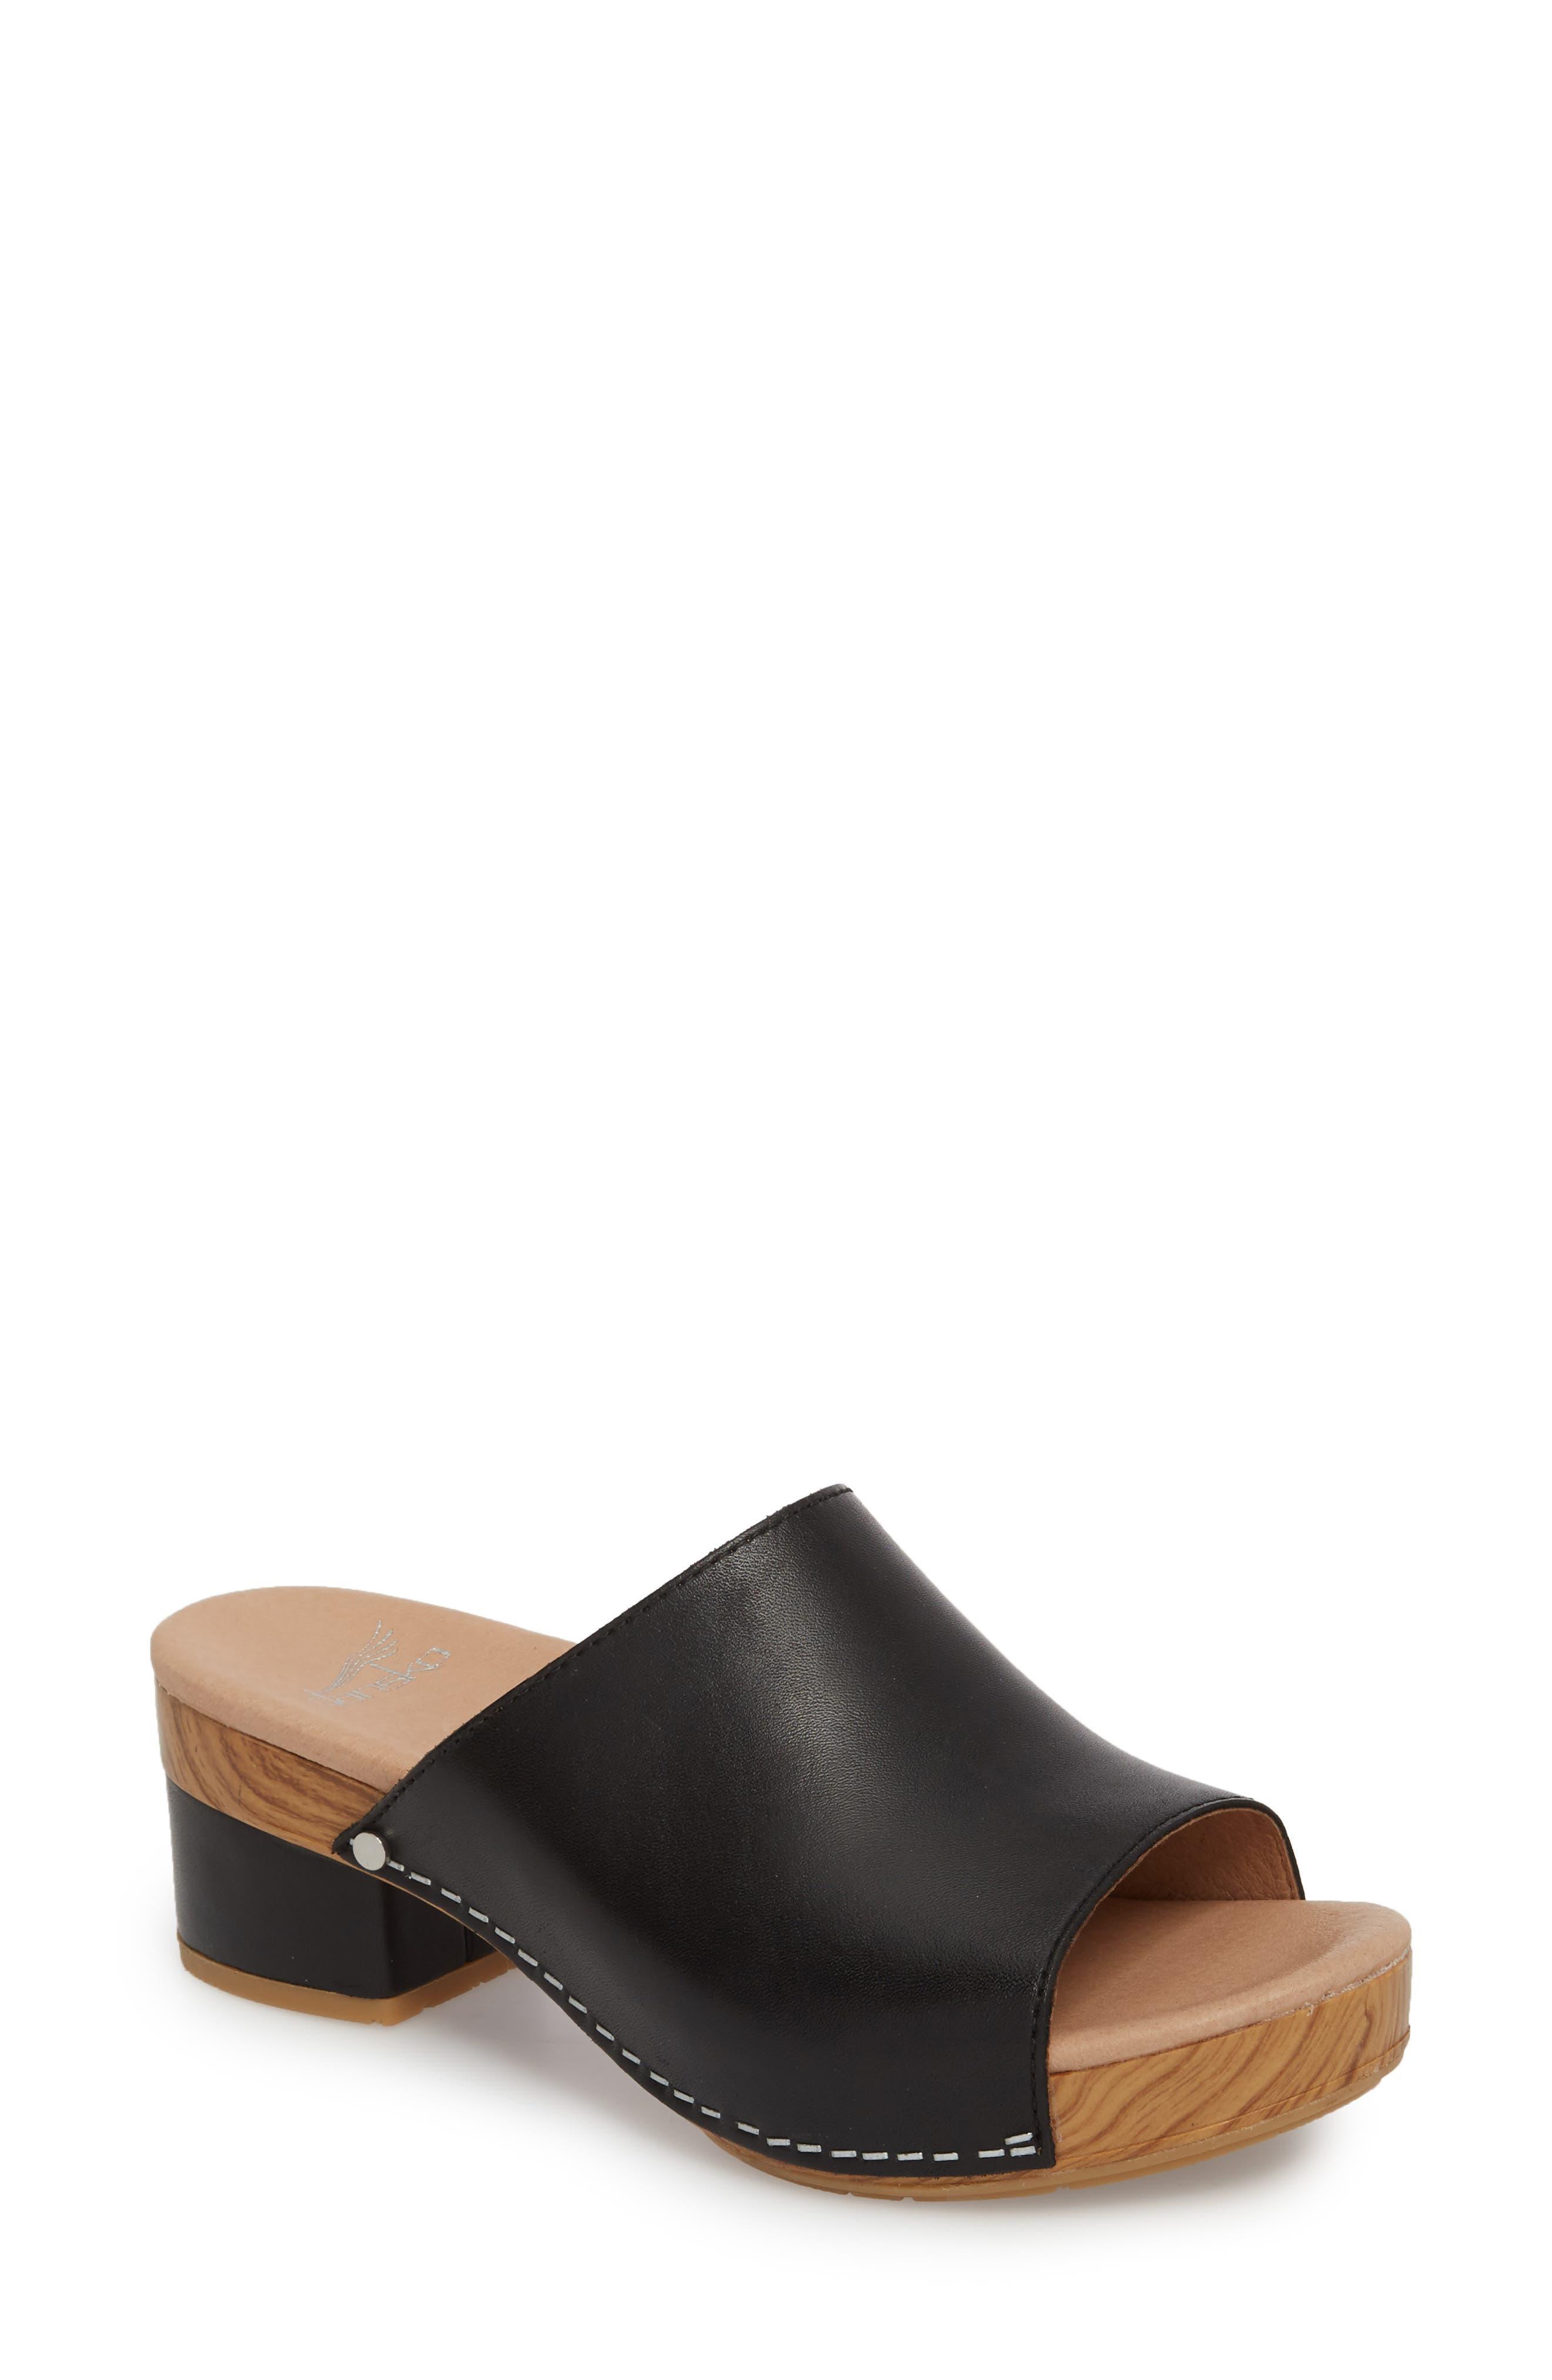 Maci Mule Sandal,                         Main,                         color, BLACK LEATHER